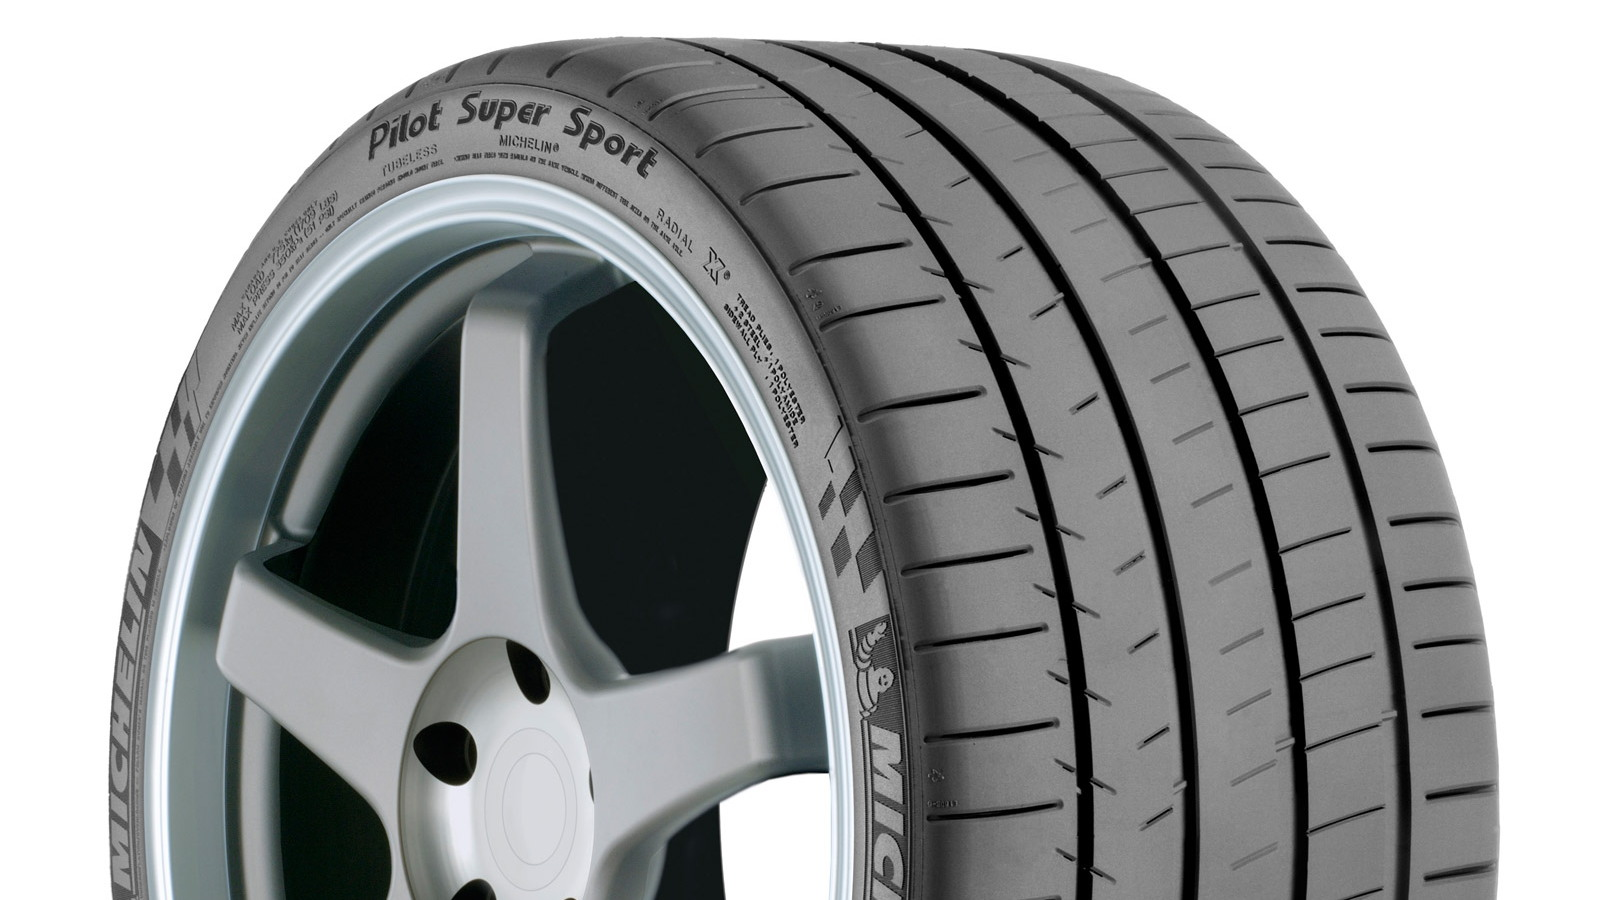 Michelin Pilot Super Sport tire fitted to the Ferrari F12 Berlinetta